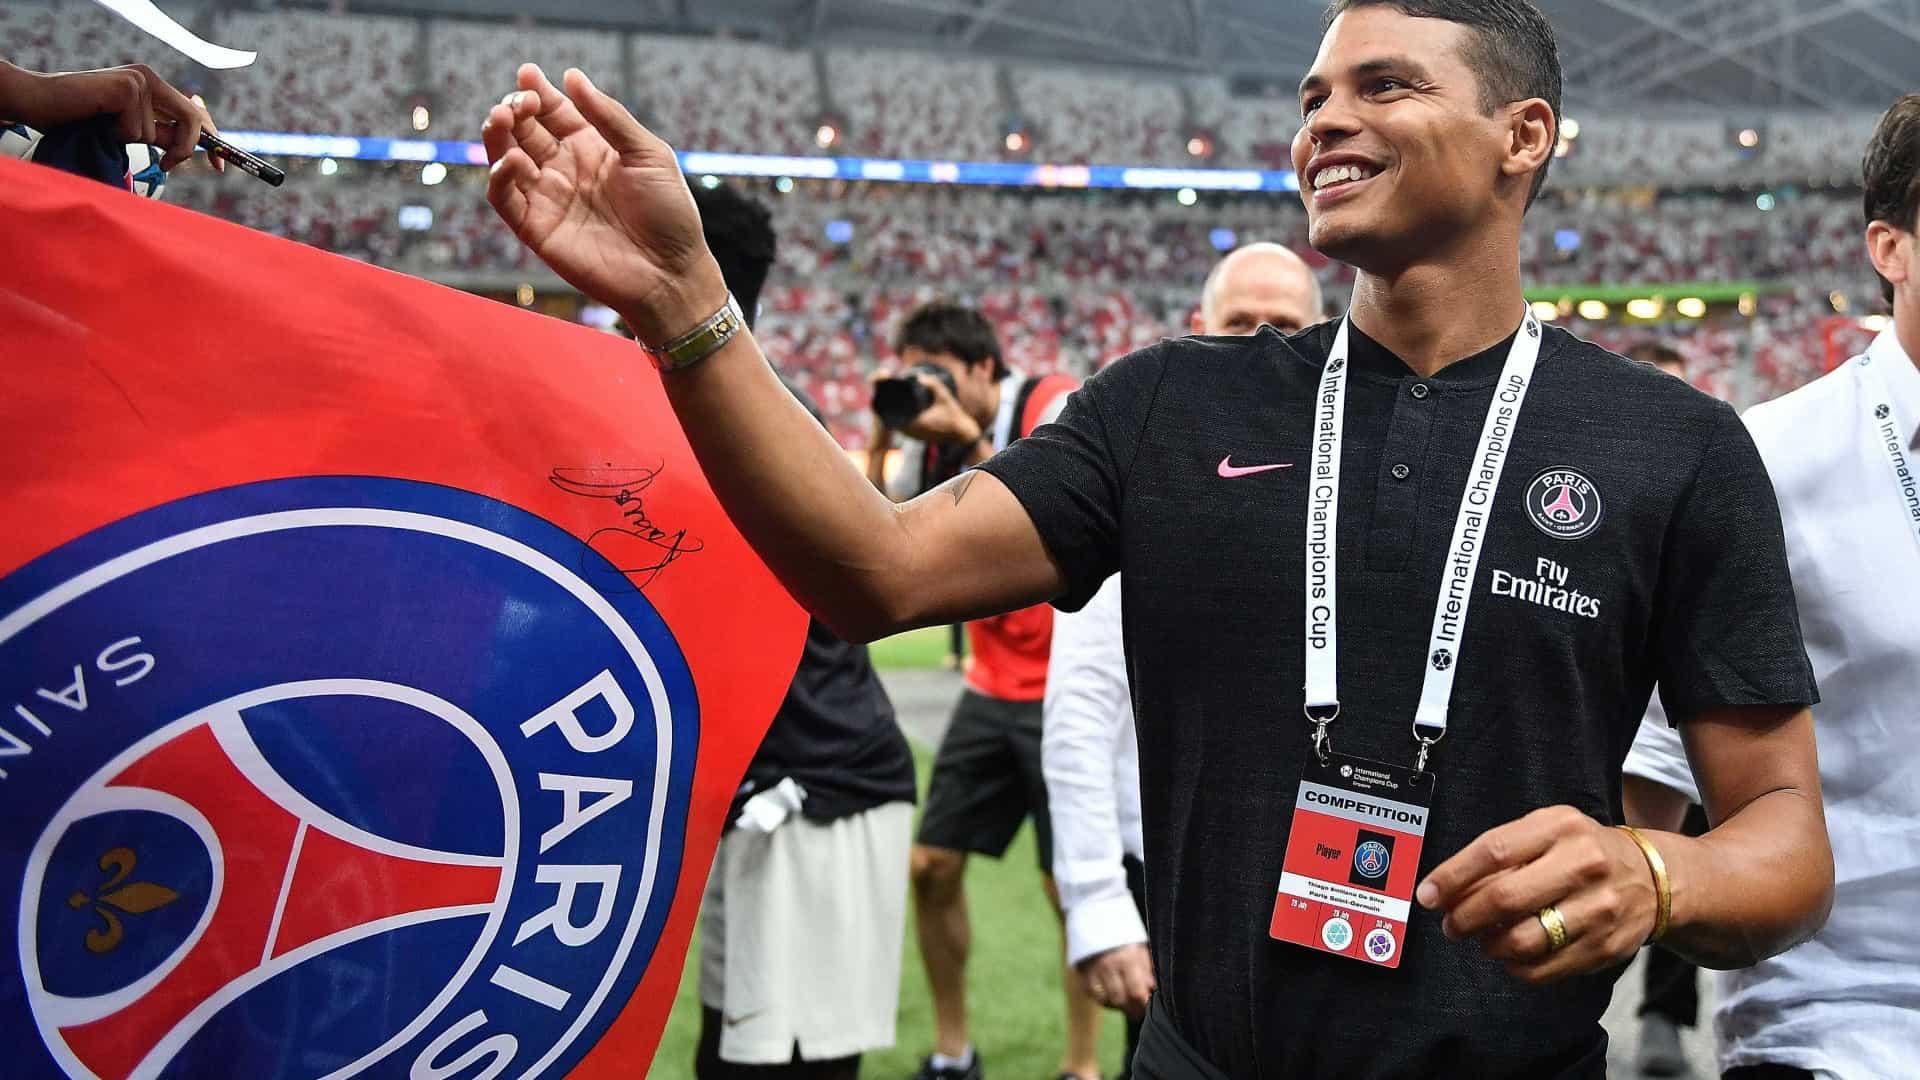 naom 5ba02f5eaa448 - Thiago Silva desabafa sobre saída do PSG: 'Merecia muito mais respeito'